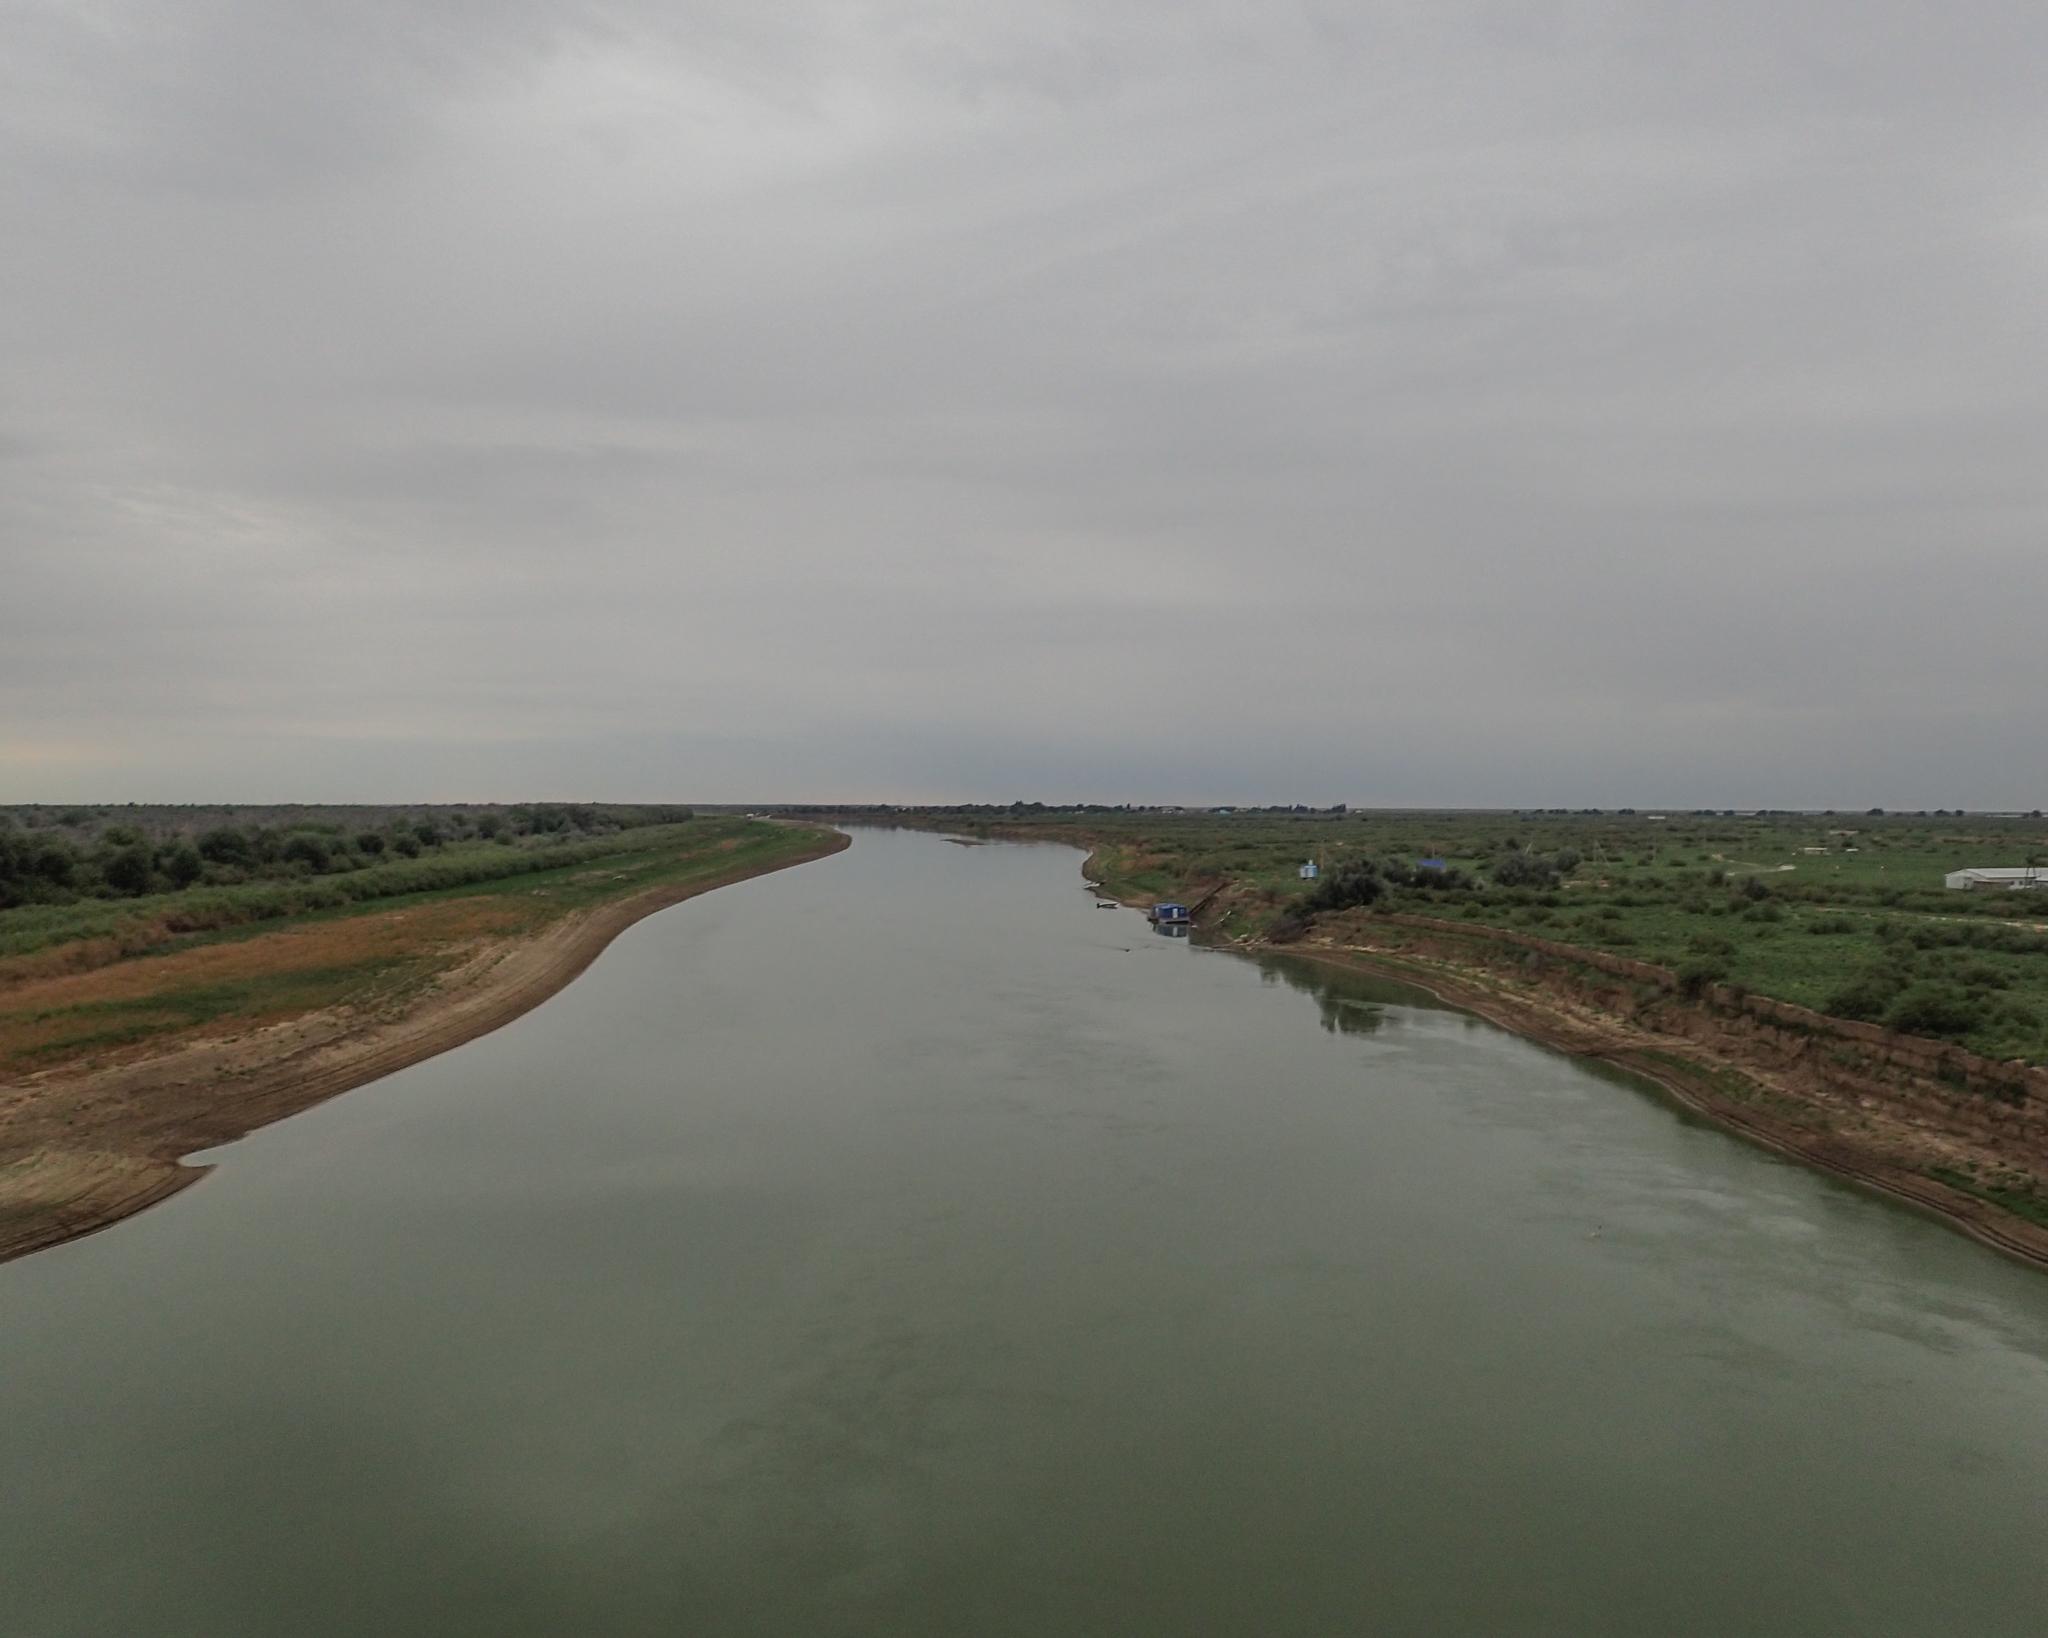 The Ural River